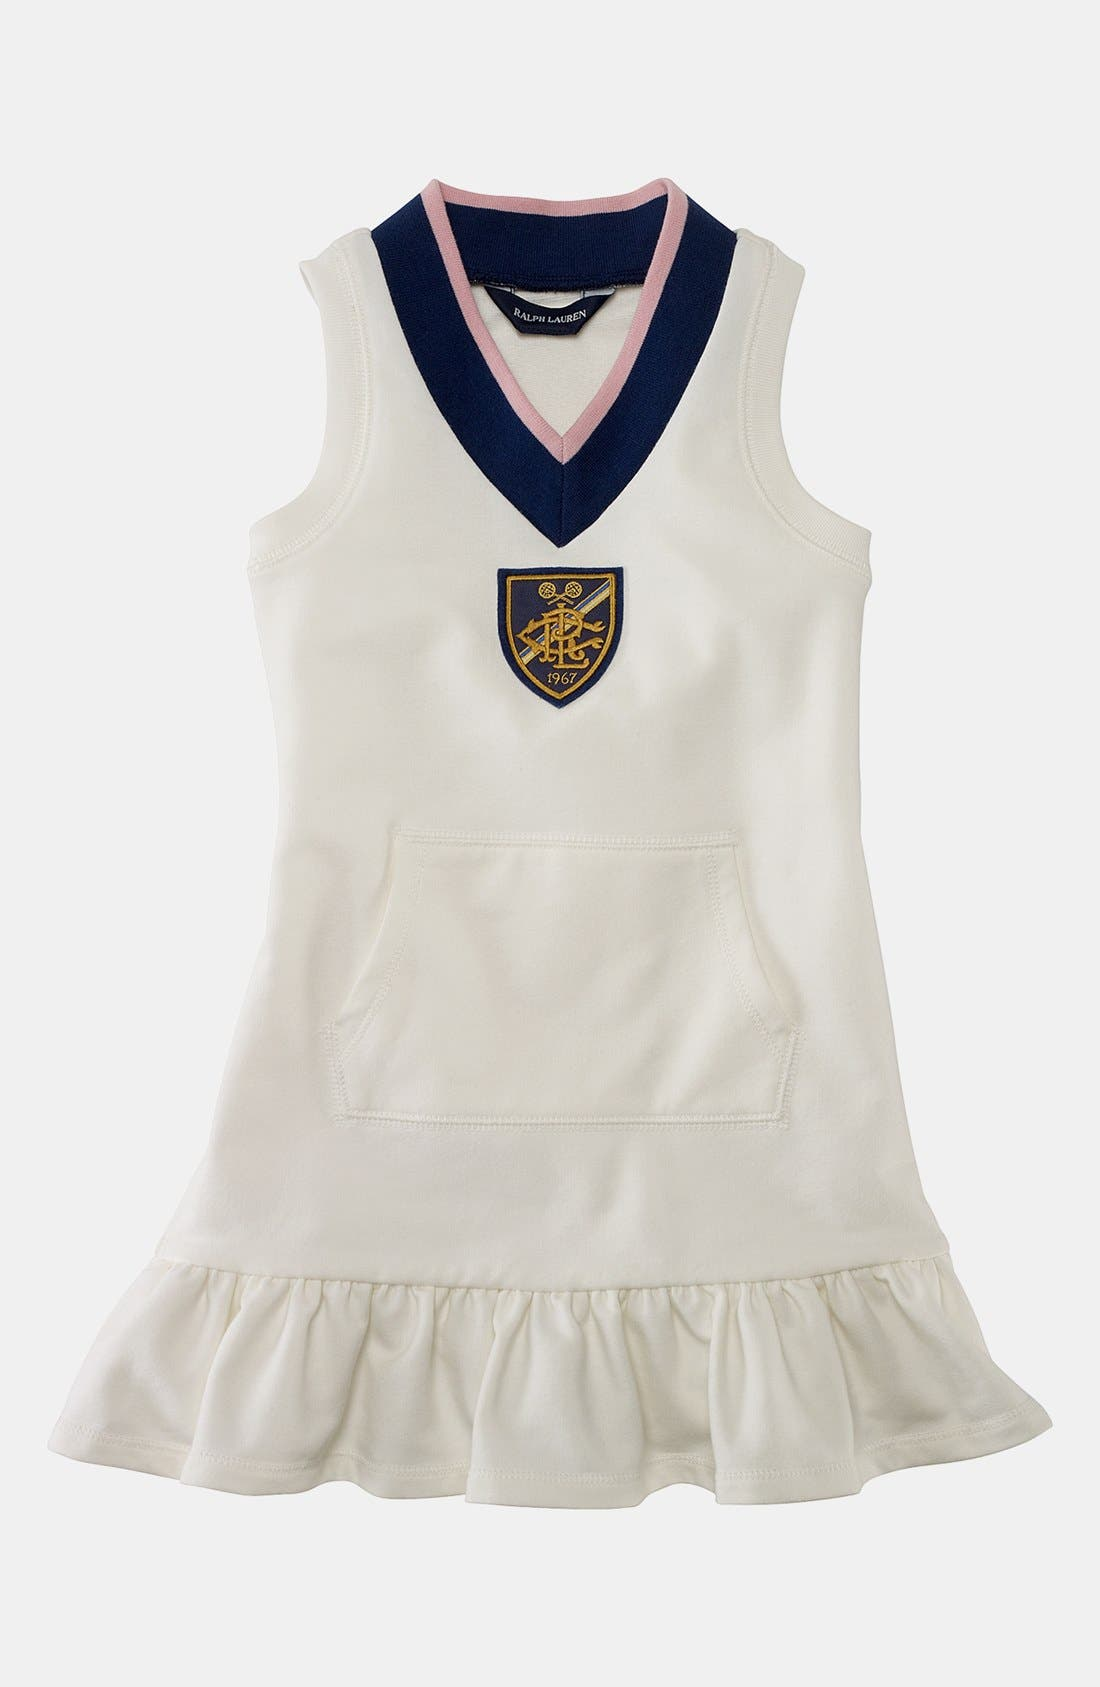 Alternate Image 1 Selected - Ralph Lauren Dress (Toddler)